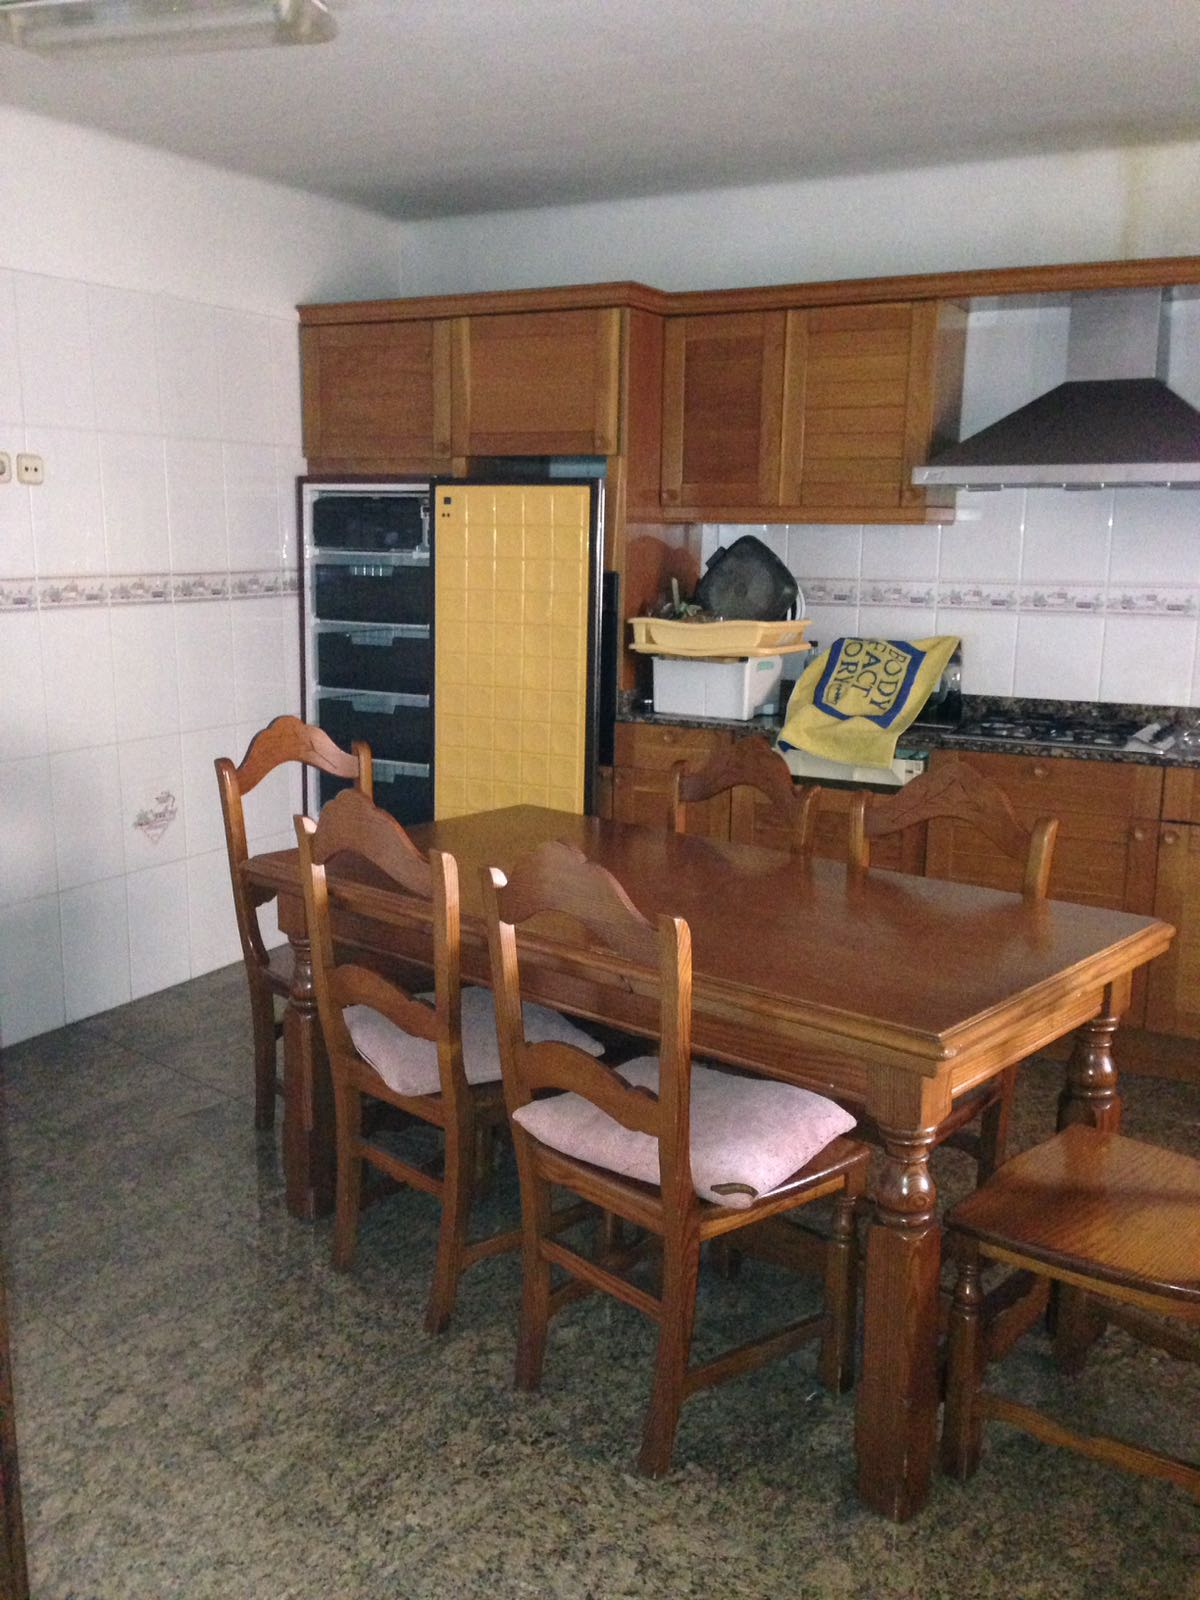 Calidohome espectacular piso en alquiler zona calle aragon - Alquiler piso zona retiro ...